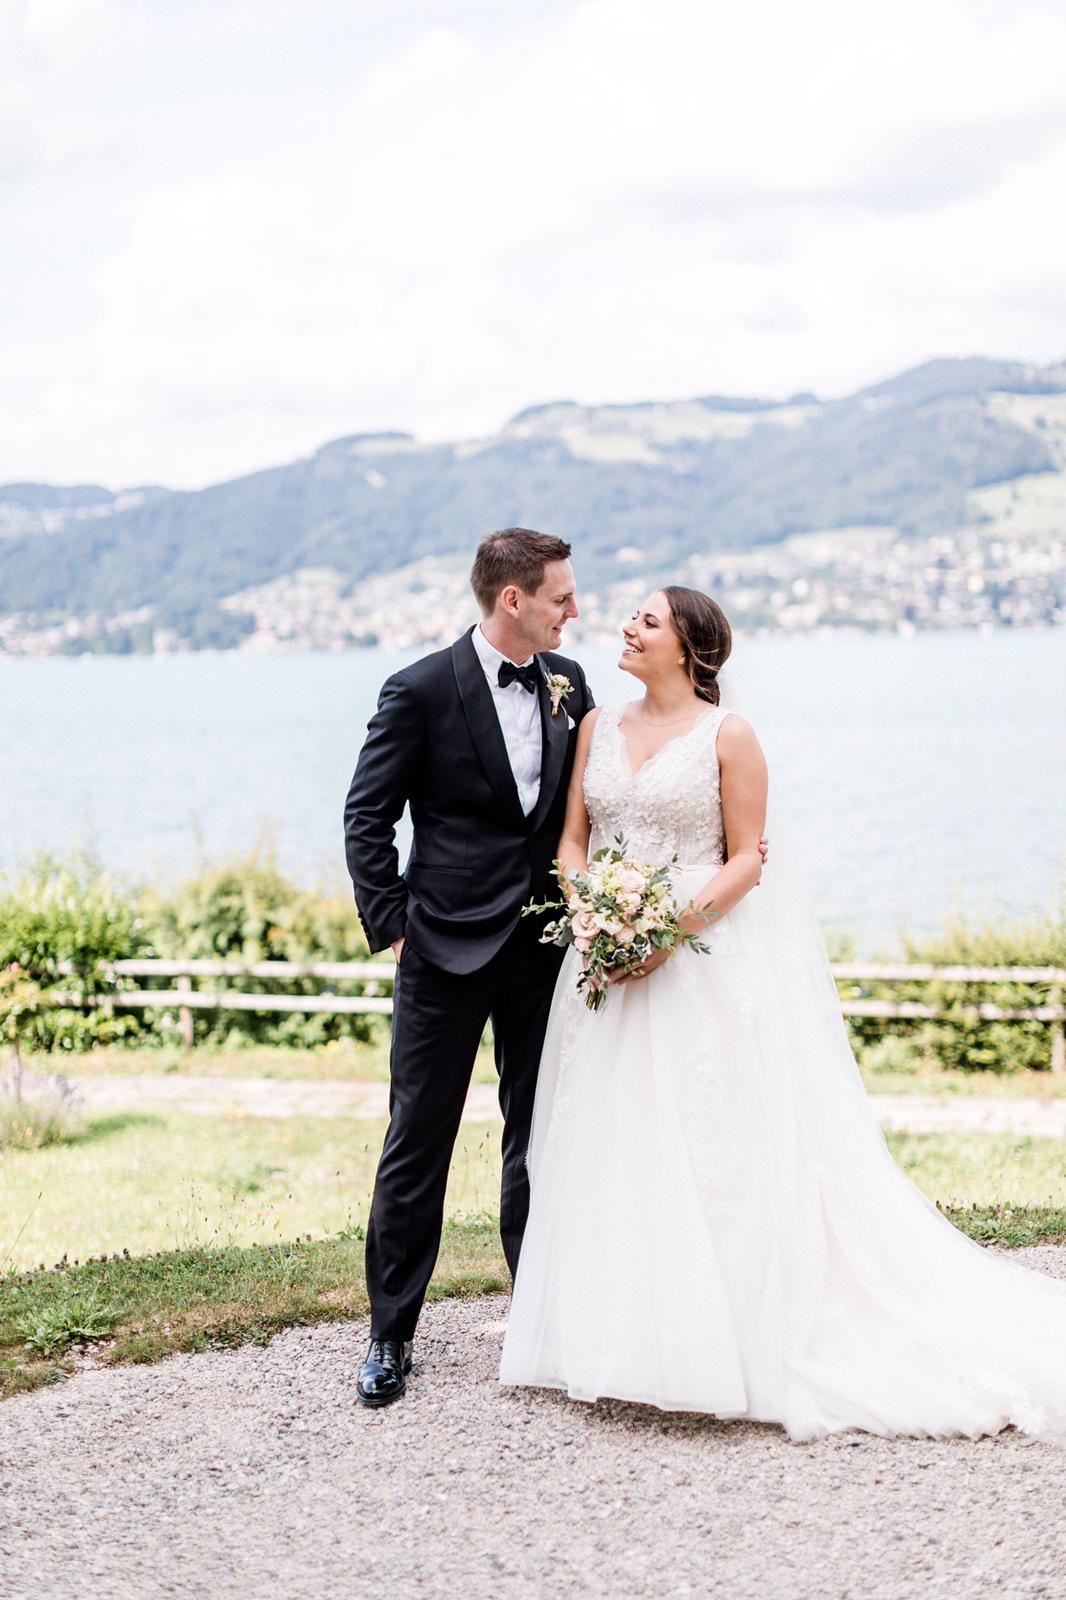 bride+groom+destination+wedding+v+neck+dress+ccm.jpeg